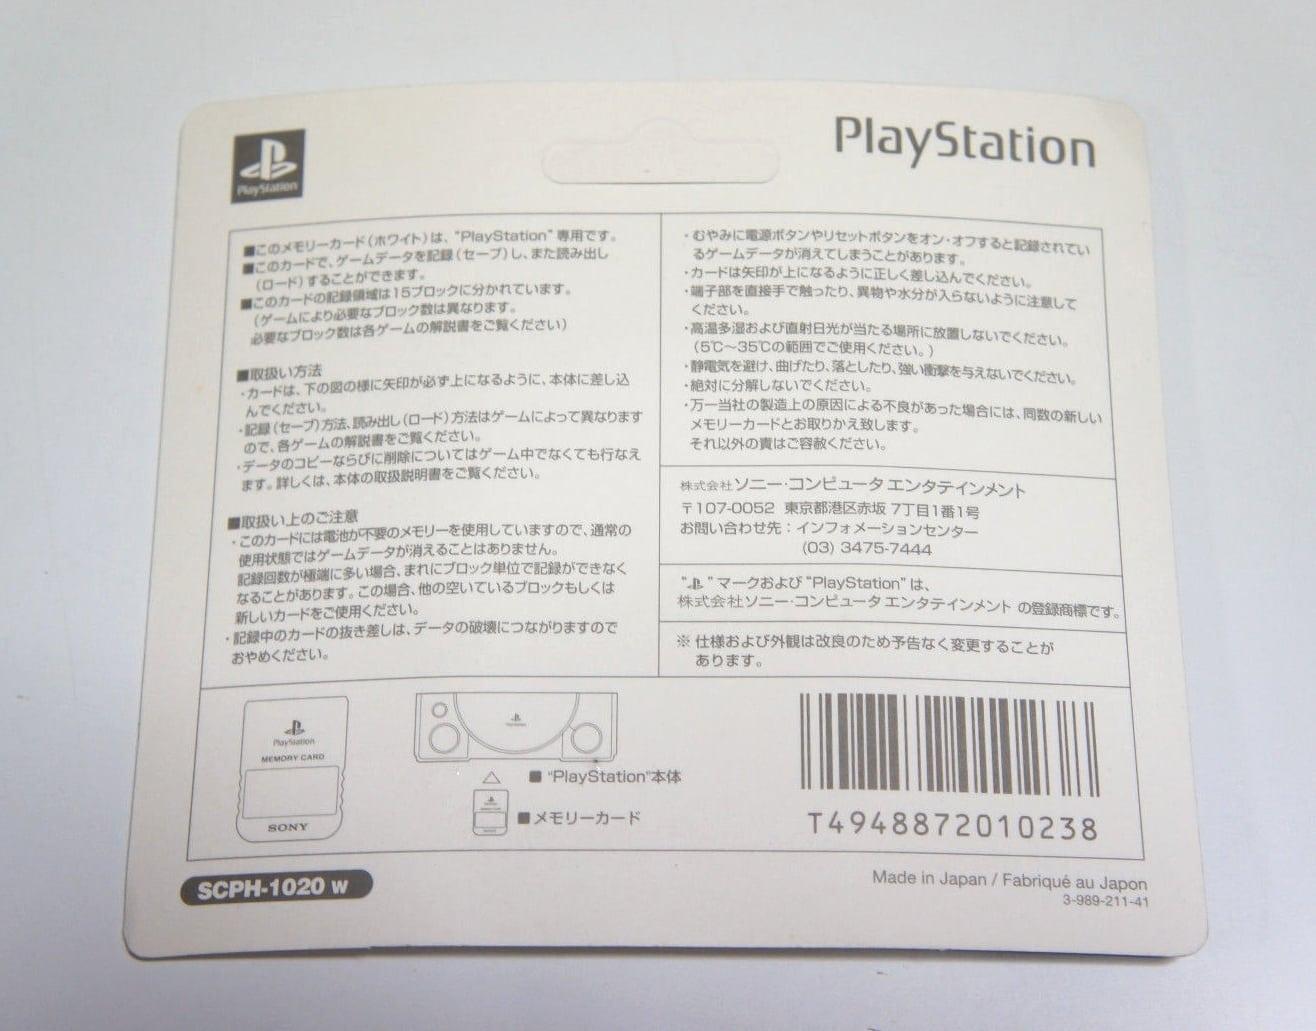 scph 1020w 2 - [SCPH-1020] Memory Card / Karta pamięci